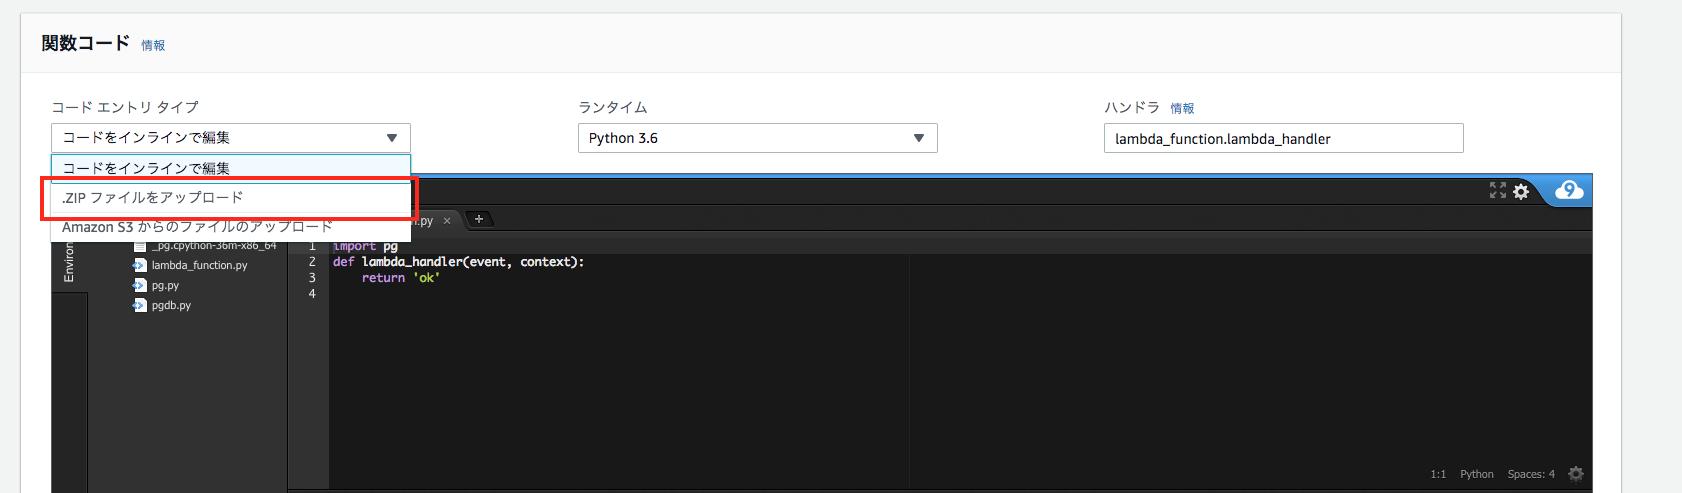 AWS LambdaでPyGreSQLを利用できなかった話 - Qiita